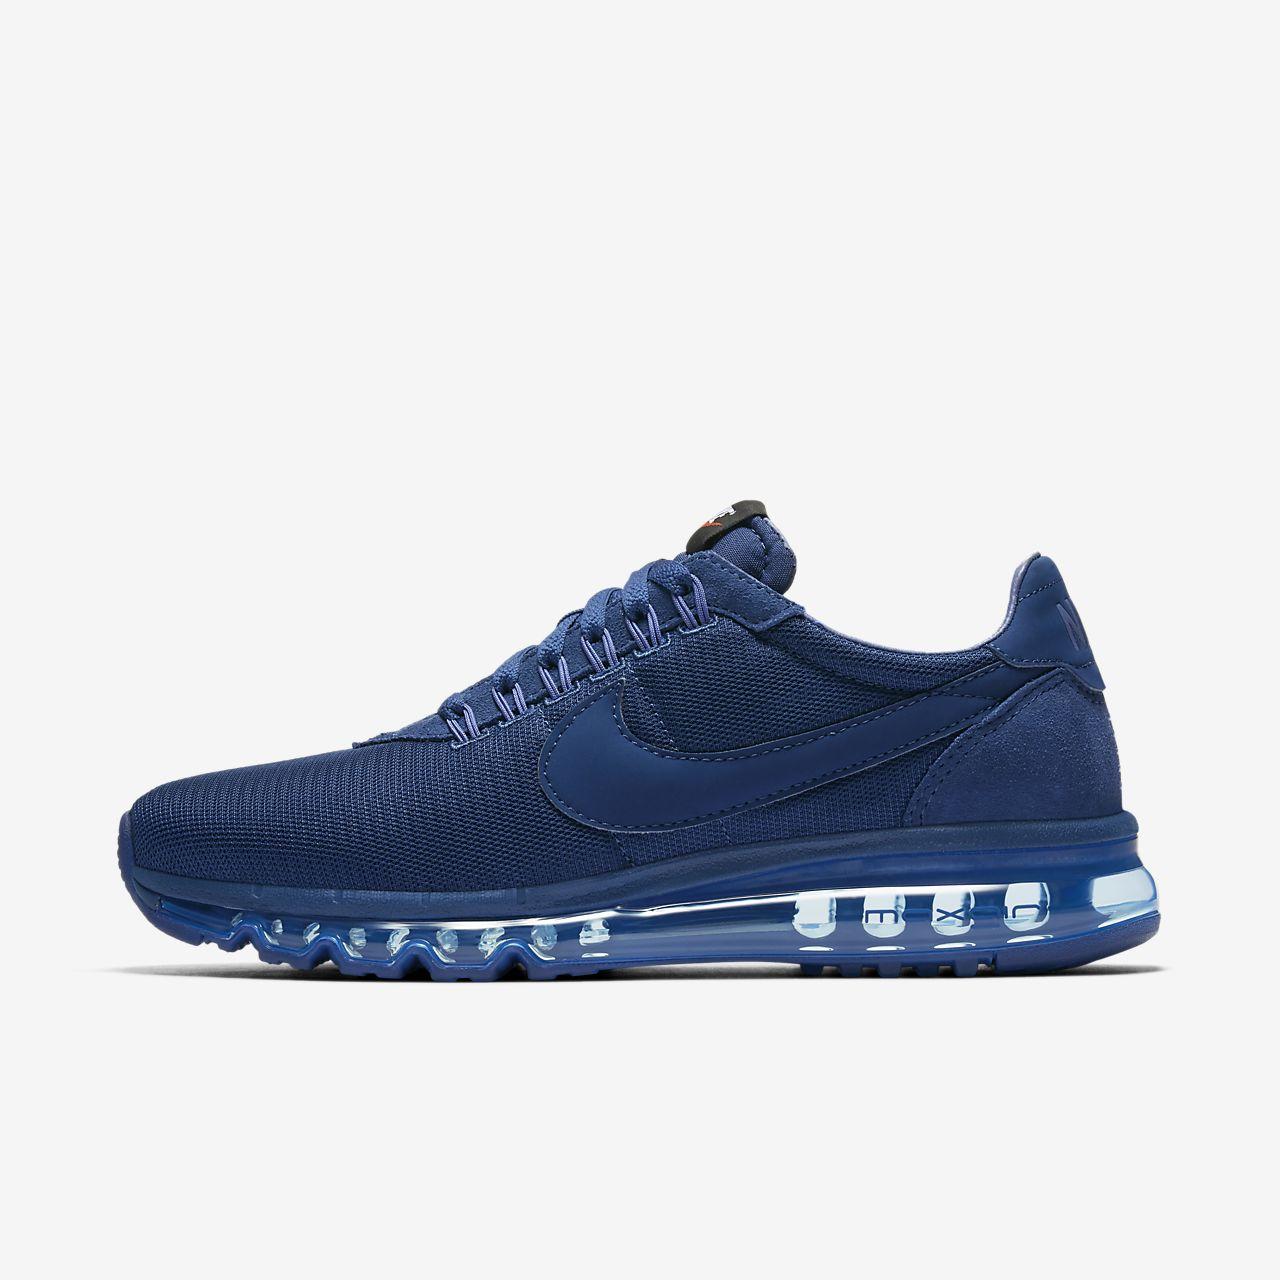 340aa68d35041 Sconti Scarpe Nike Off62 Acquista Calzino wWcRYHq8Iw